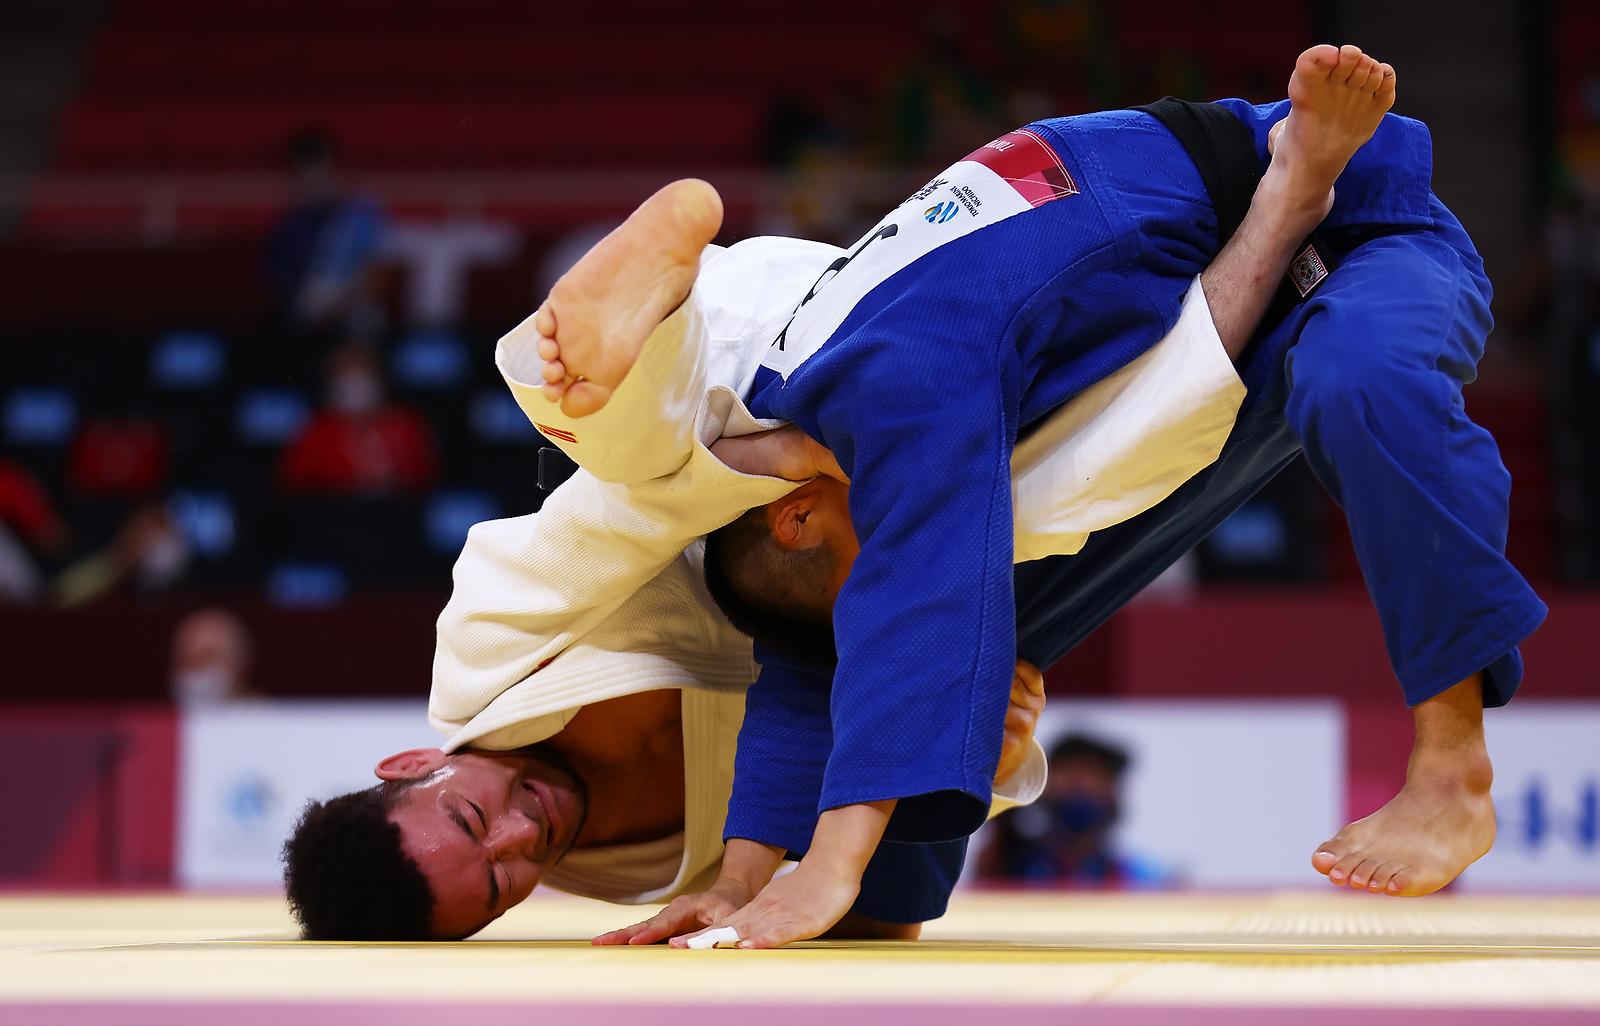 Tokyo 2020 Paralympic Games - Men -66 kg Final of Repechage A - Nippon Budokan, Tokyo, Japan - August 27, 2021. Munkhbat Aajim of Mongolia in action against Yujiro Seto of Japan. REUTERS